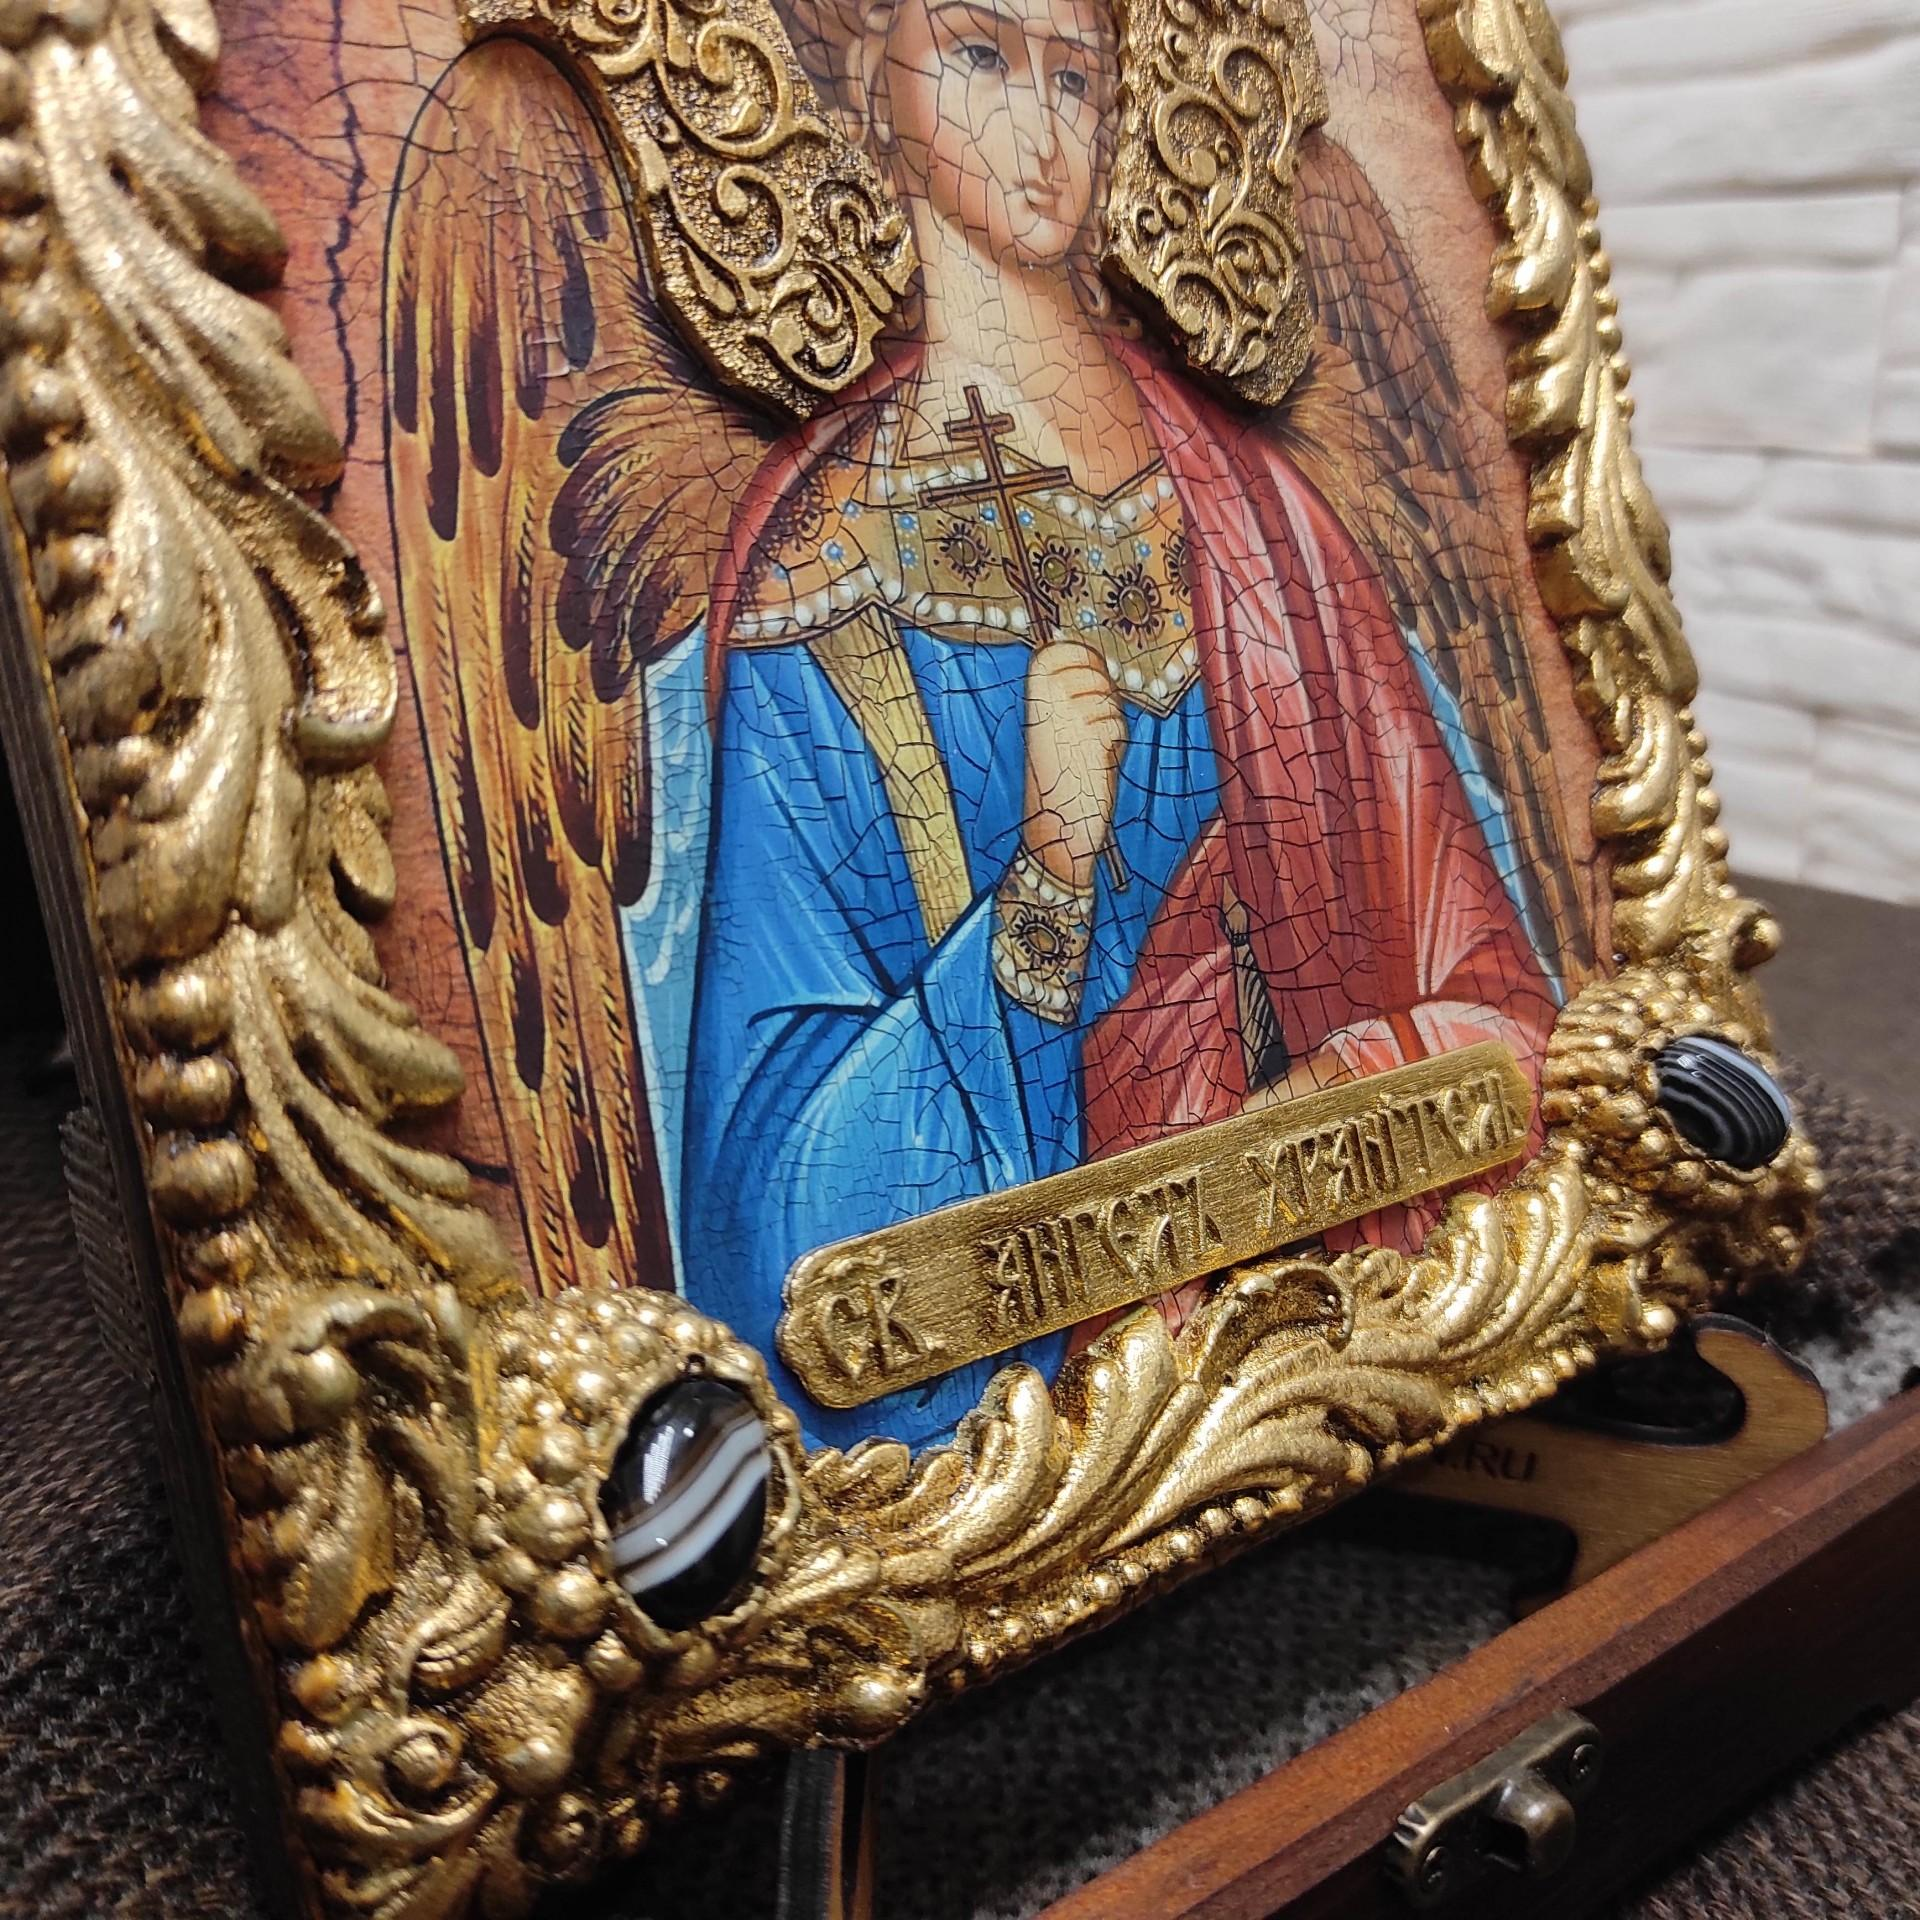 Фото ризы Ангела Хранителя в футляре